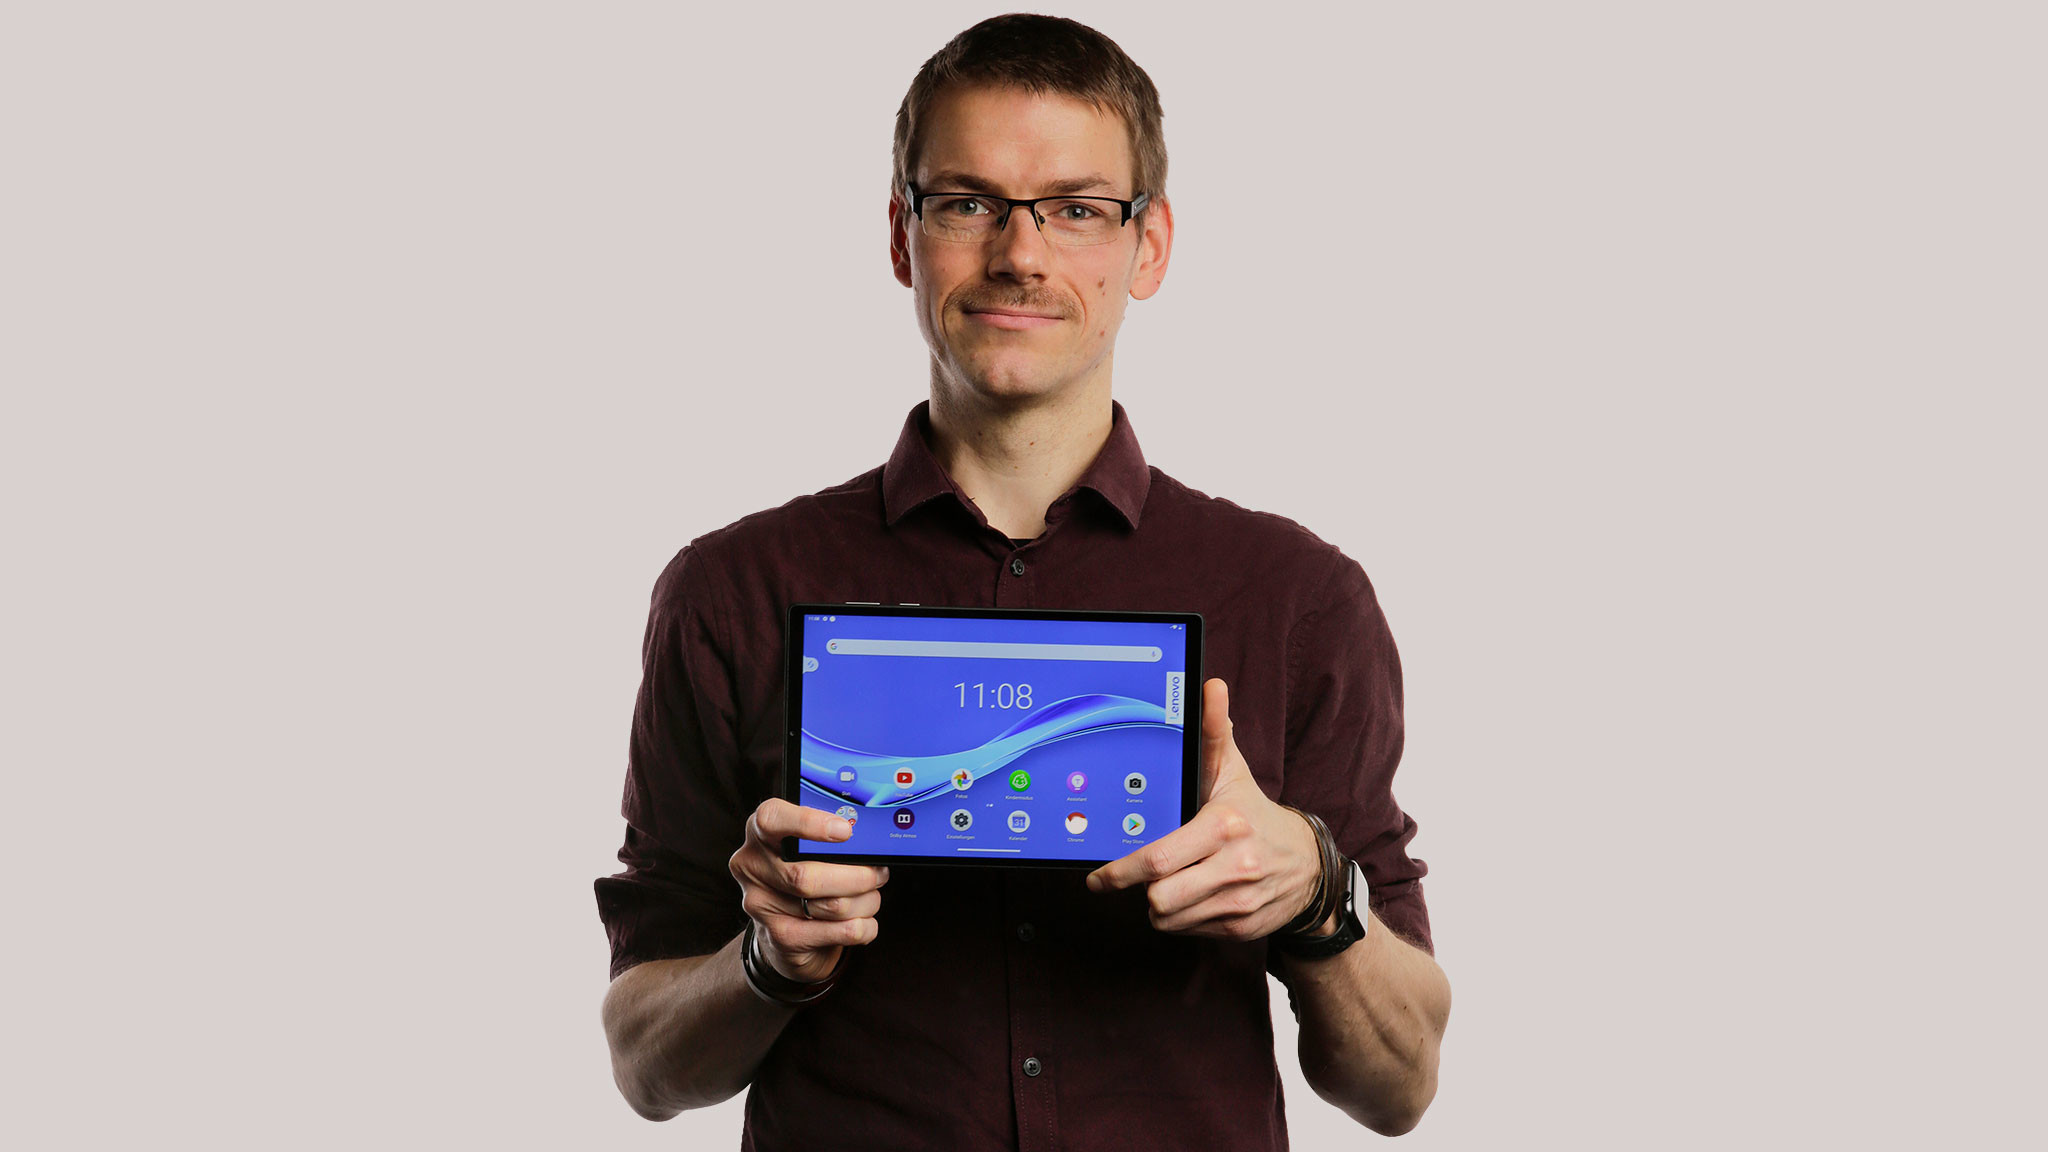 Redakteur hält das Lenovo Smart Tab M10 FHD Plus Gen 2.©COMPUTER BILD, Cornelius Braun